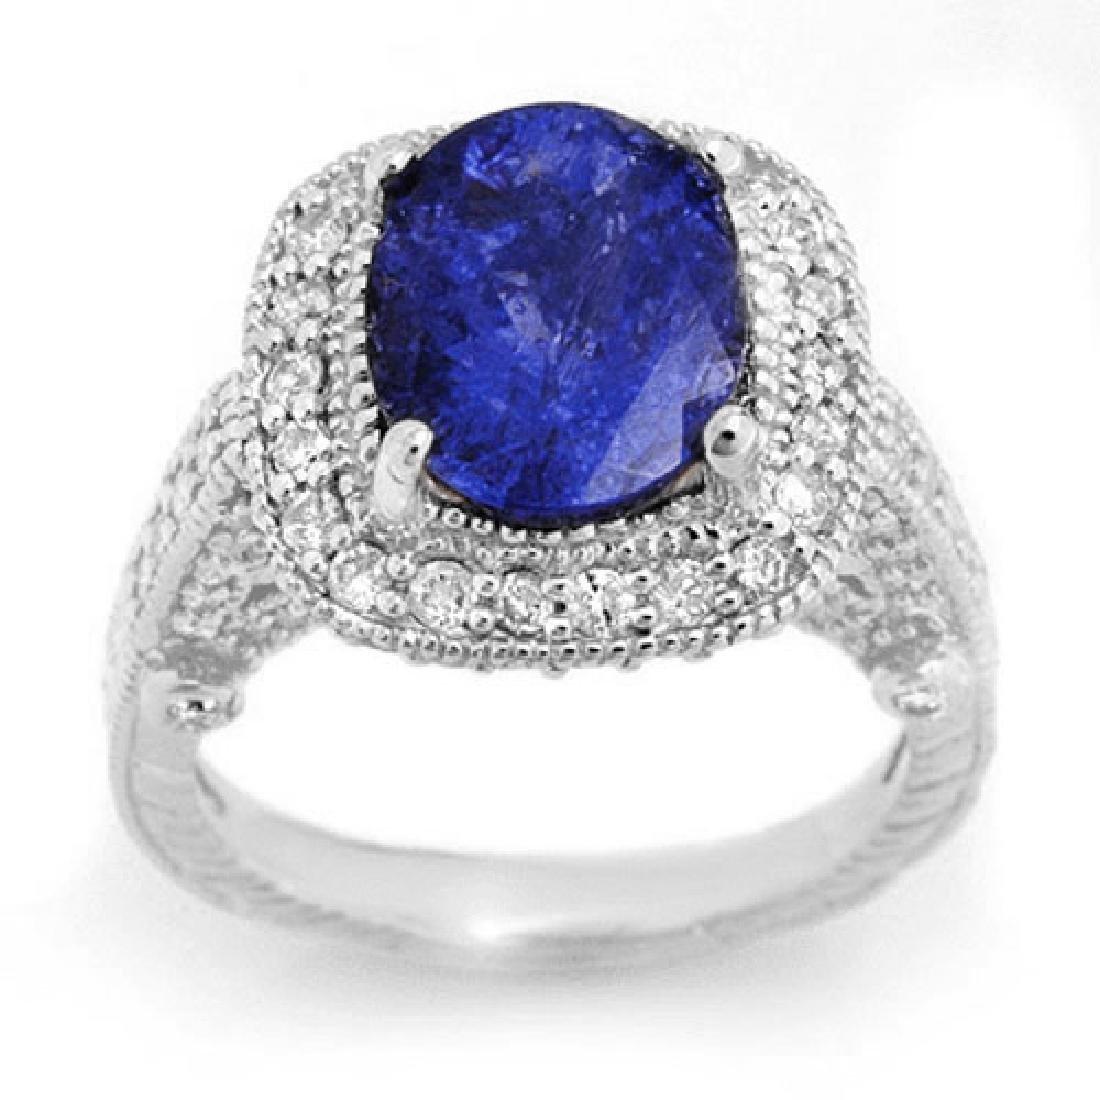 5.40 CTW Tanzanite & Diamond Ring 14K White Gold